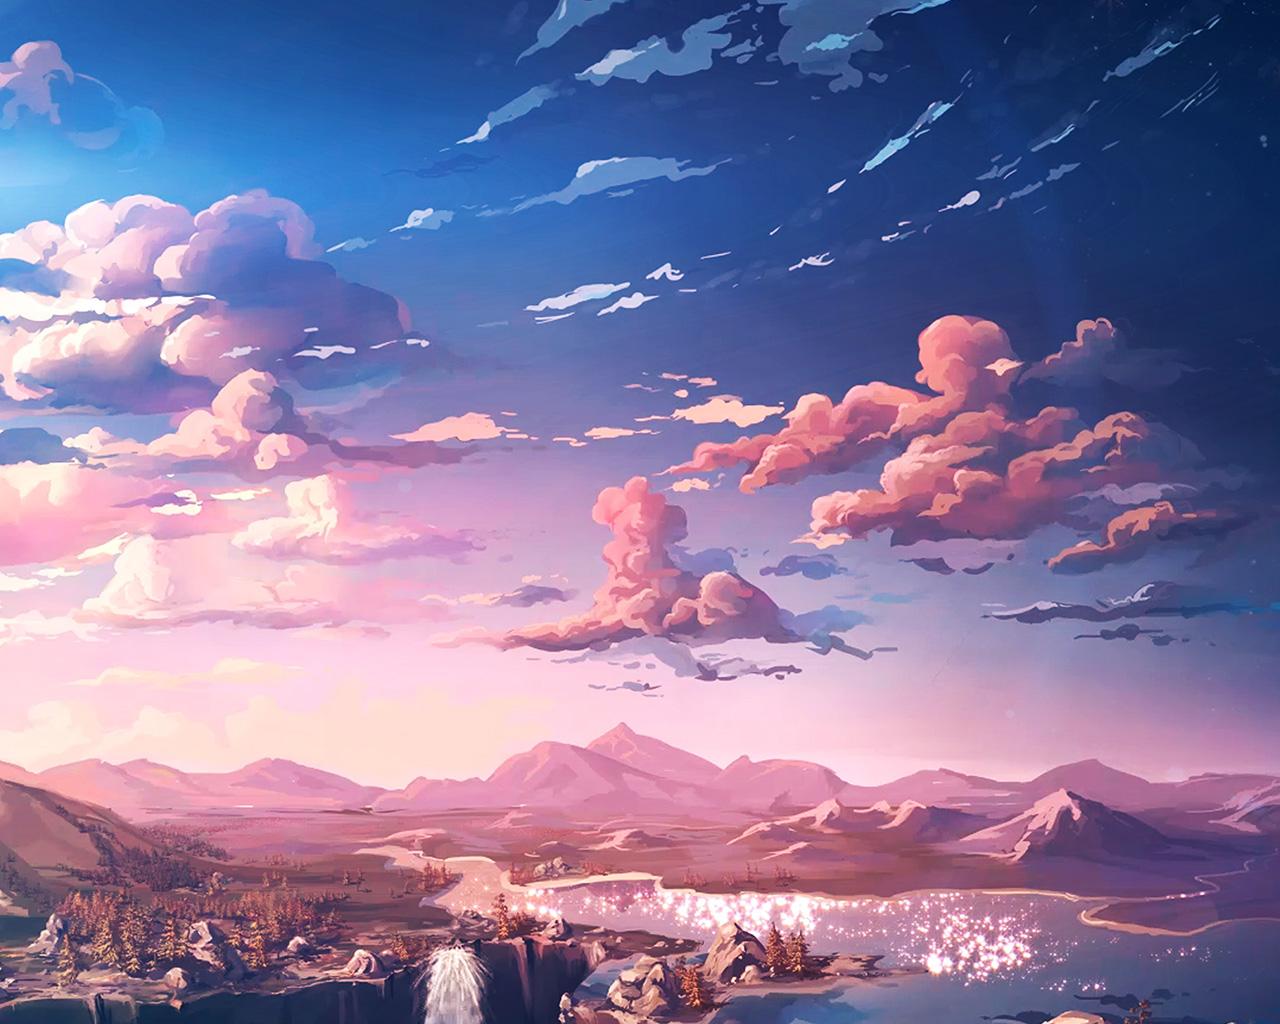 aq84-nature-anime-art-sea-art-falre-wallpaper